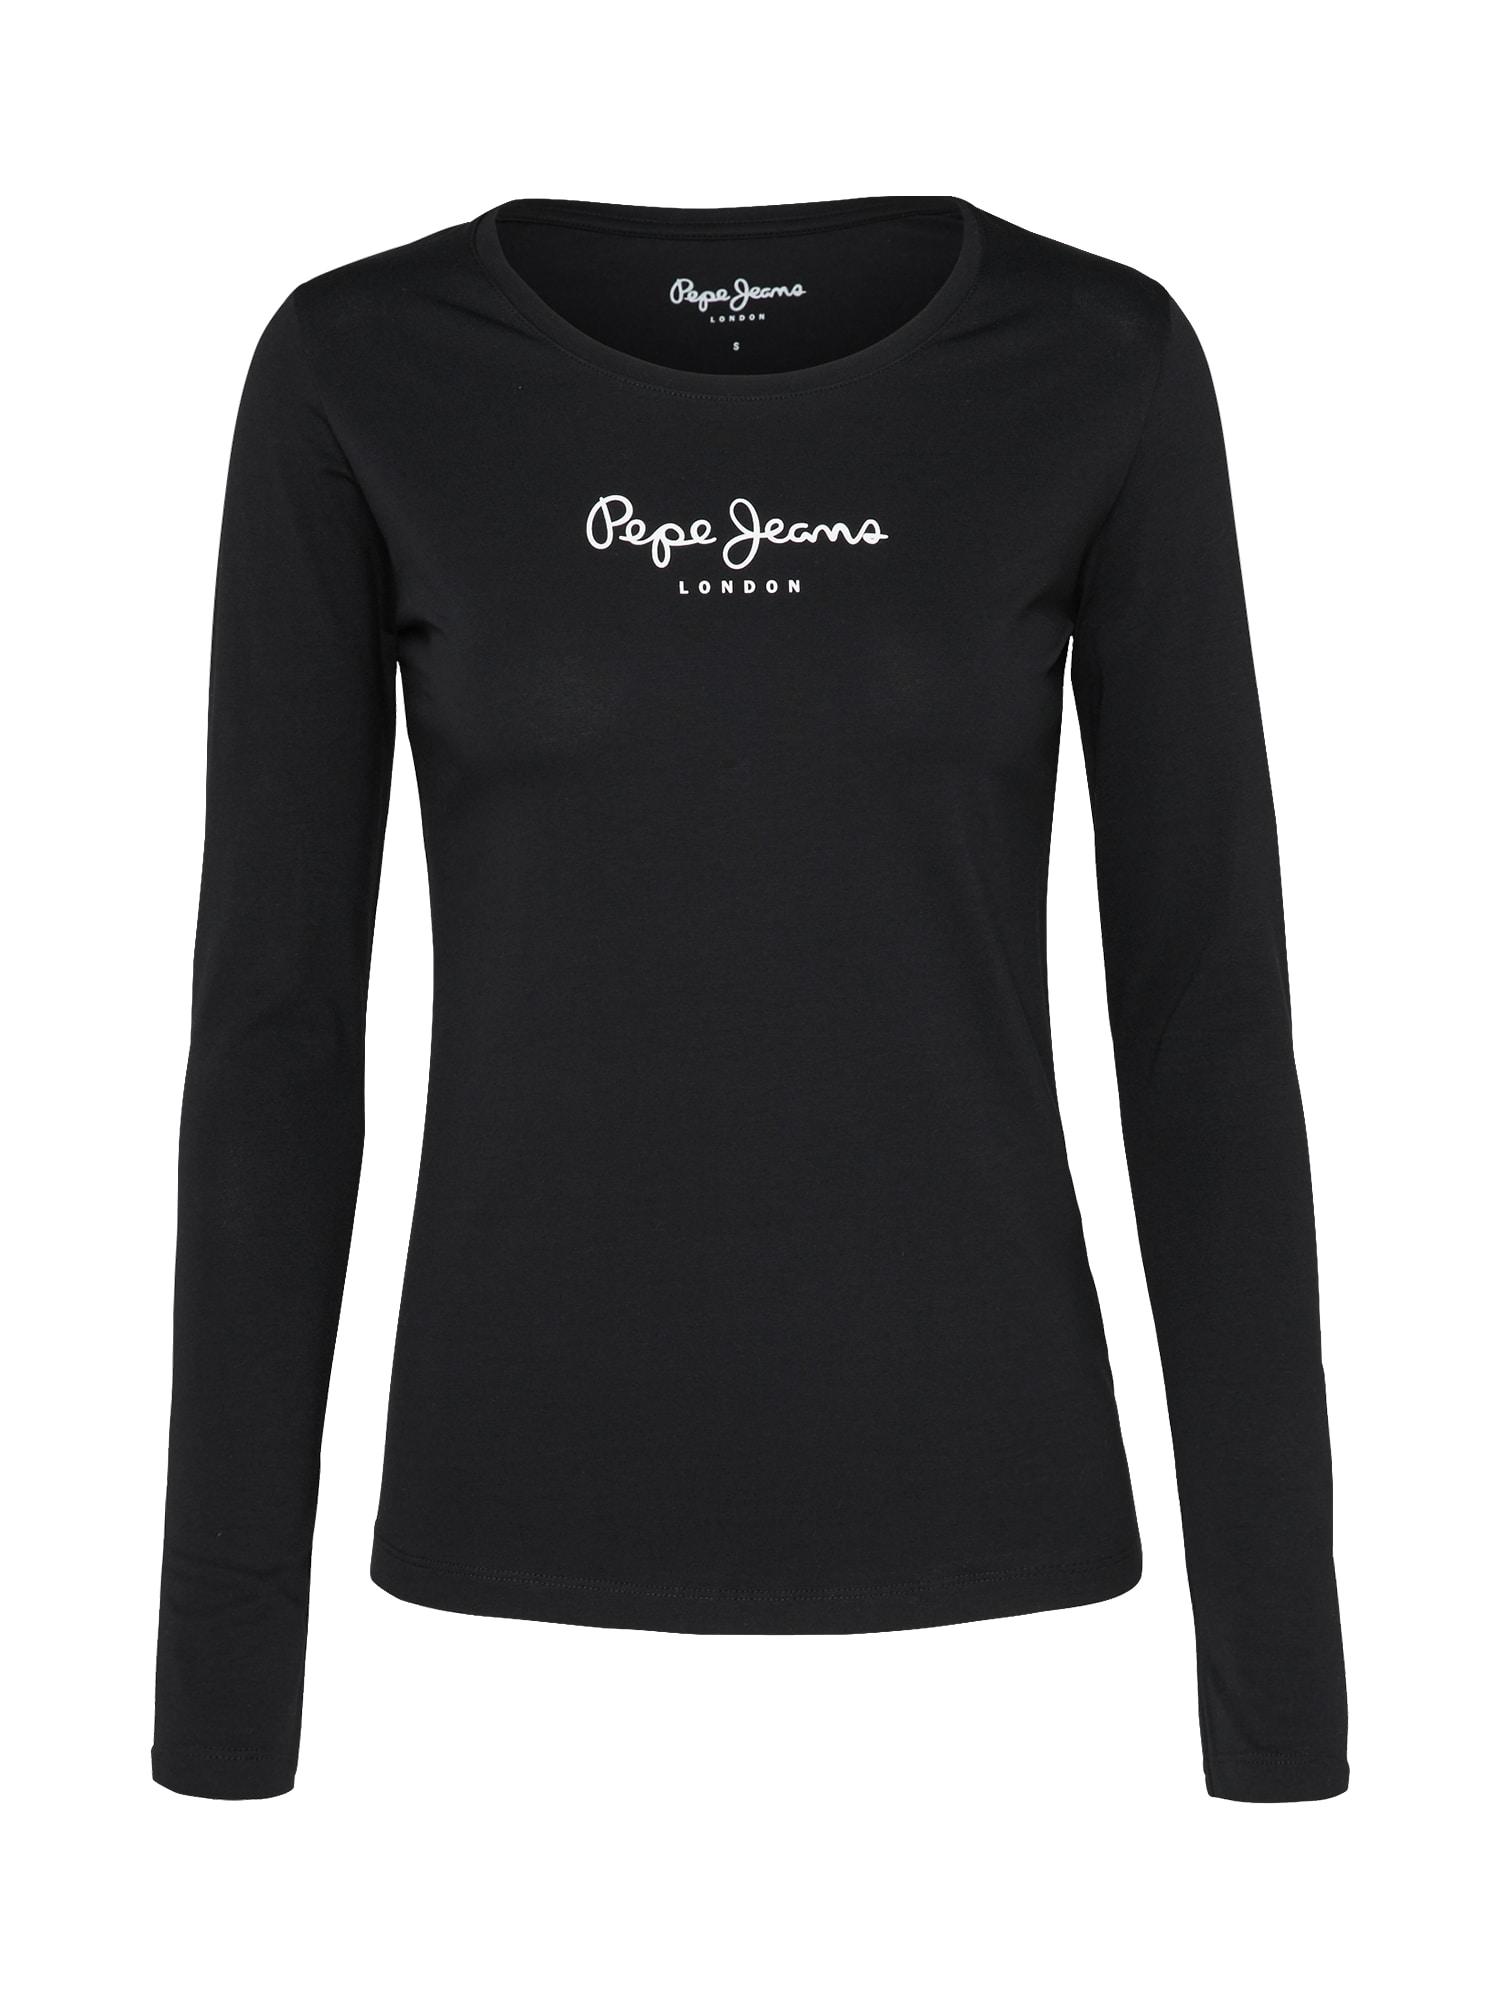 Pepe Jeans Dames Shirt NEW VIRGINIA L S zwart wit